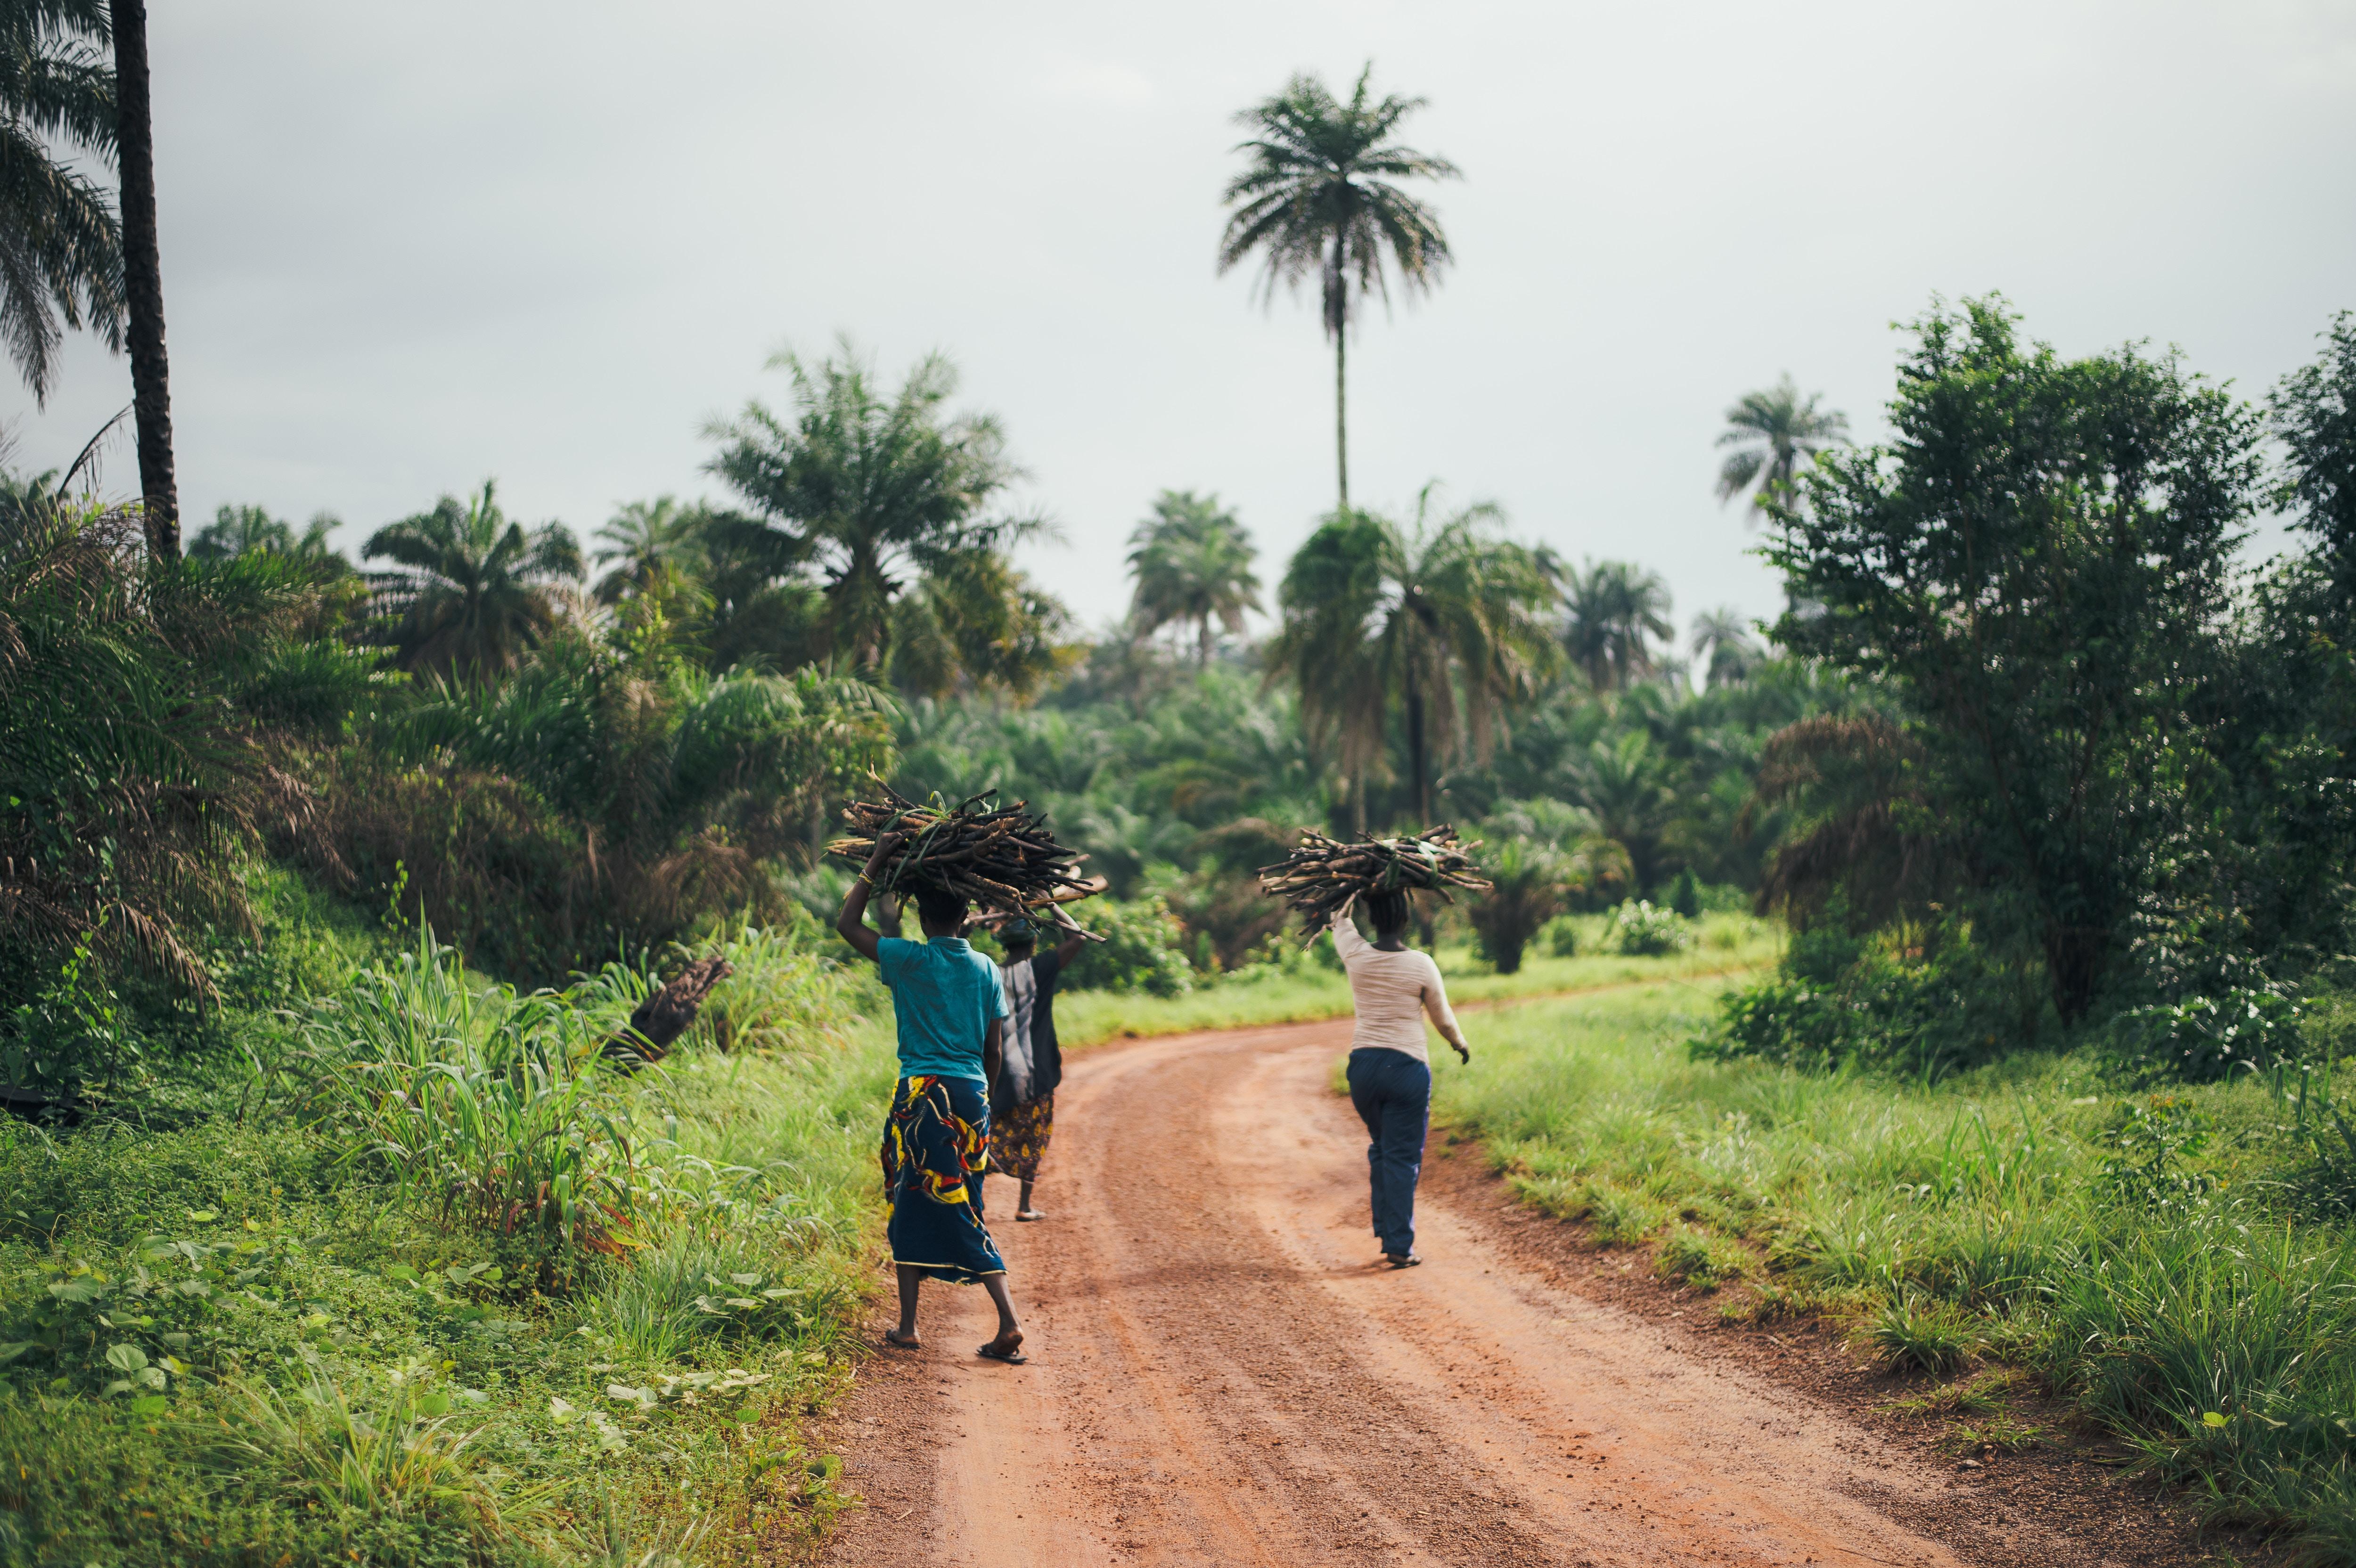 Burned by tragedy after tragedy, Sierra Leone desperately needs Jesus